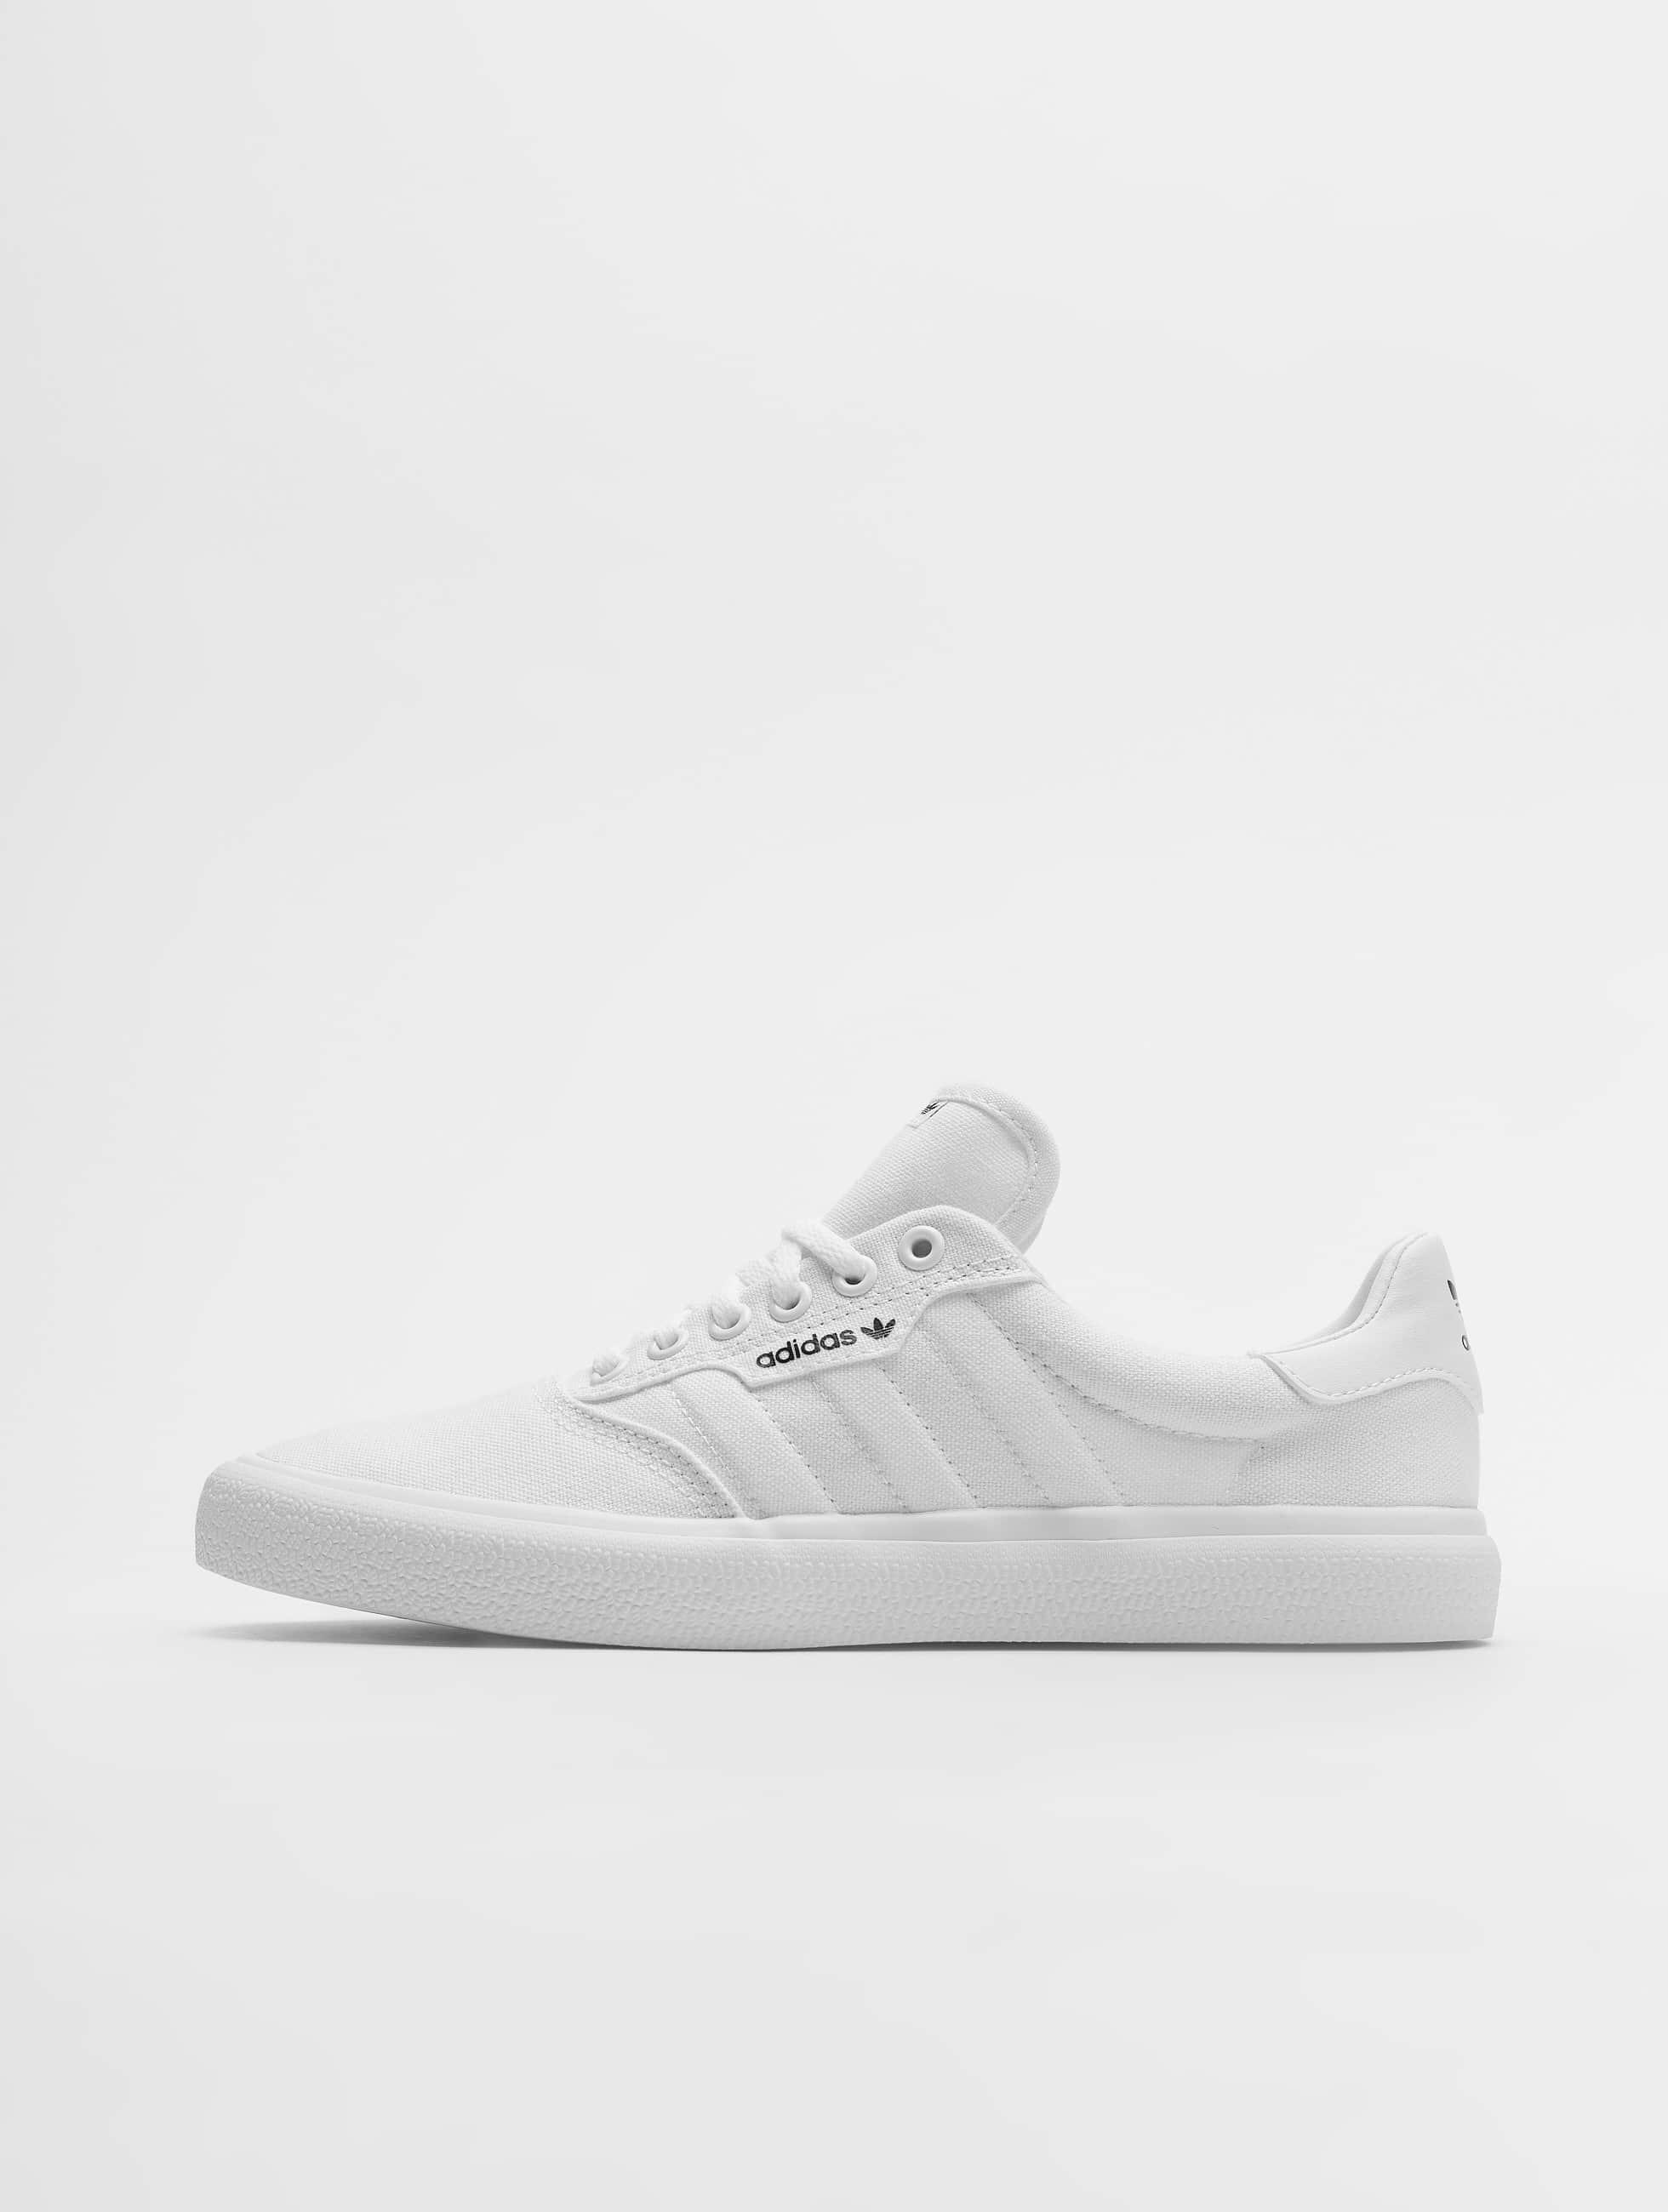 Adidas Originals 3mc Sneakers Sneakers Sneakers Ftwr White